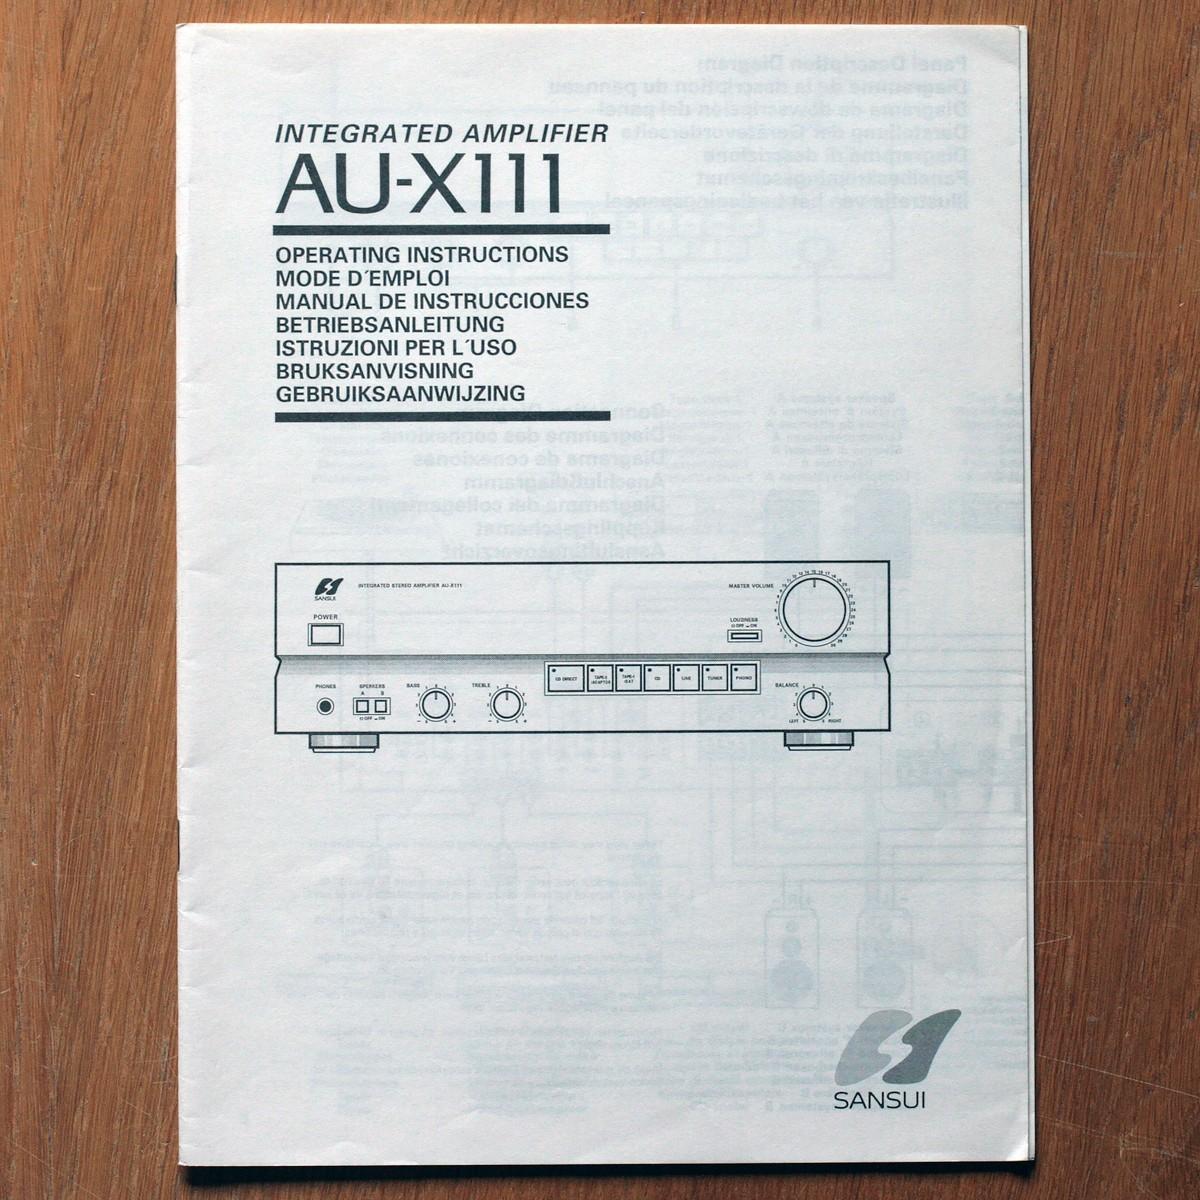 Sansui • Amplificateur • AU-X111 • Manuel utilisateur • User manual • Bedienungsanleitung • Manual de instrucciones • Instruzioni per l'uso